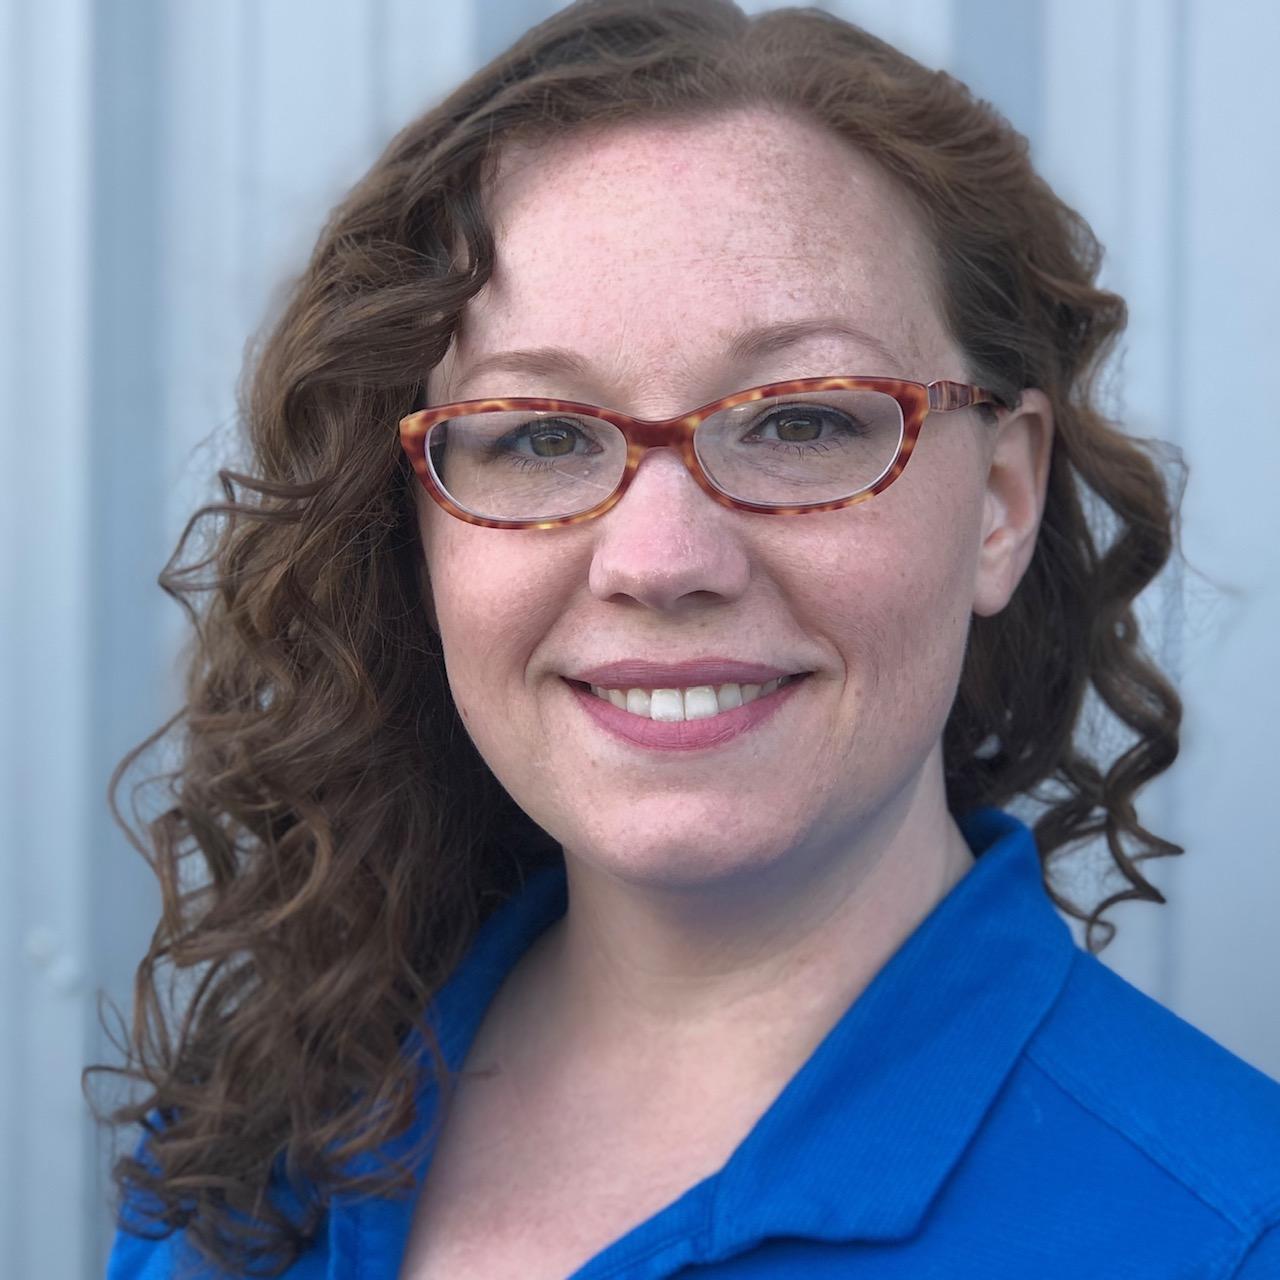 Katie Pemberton